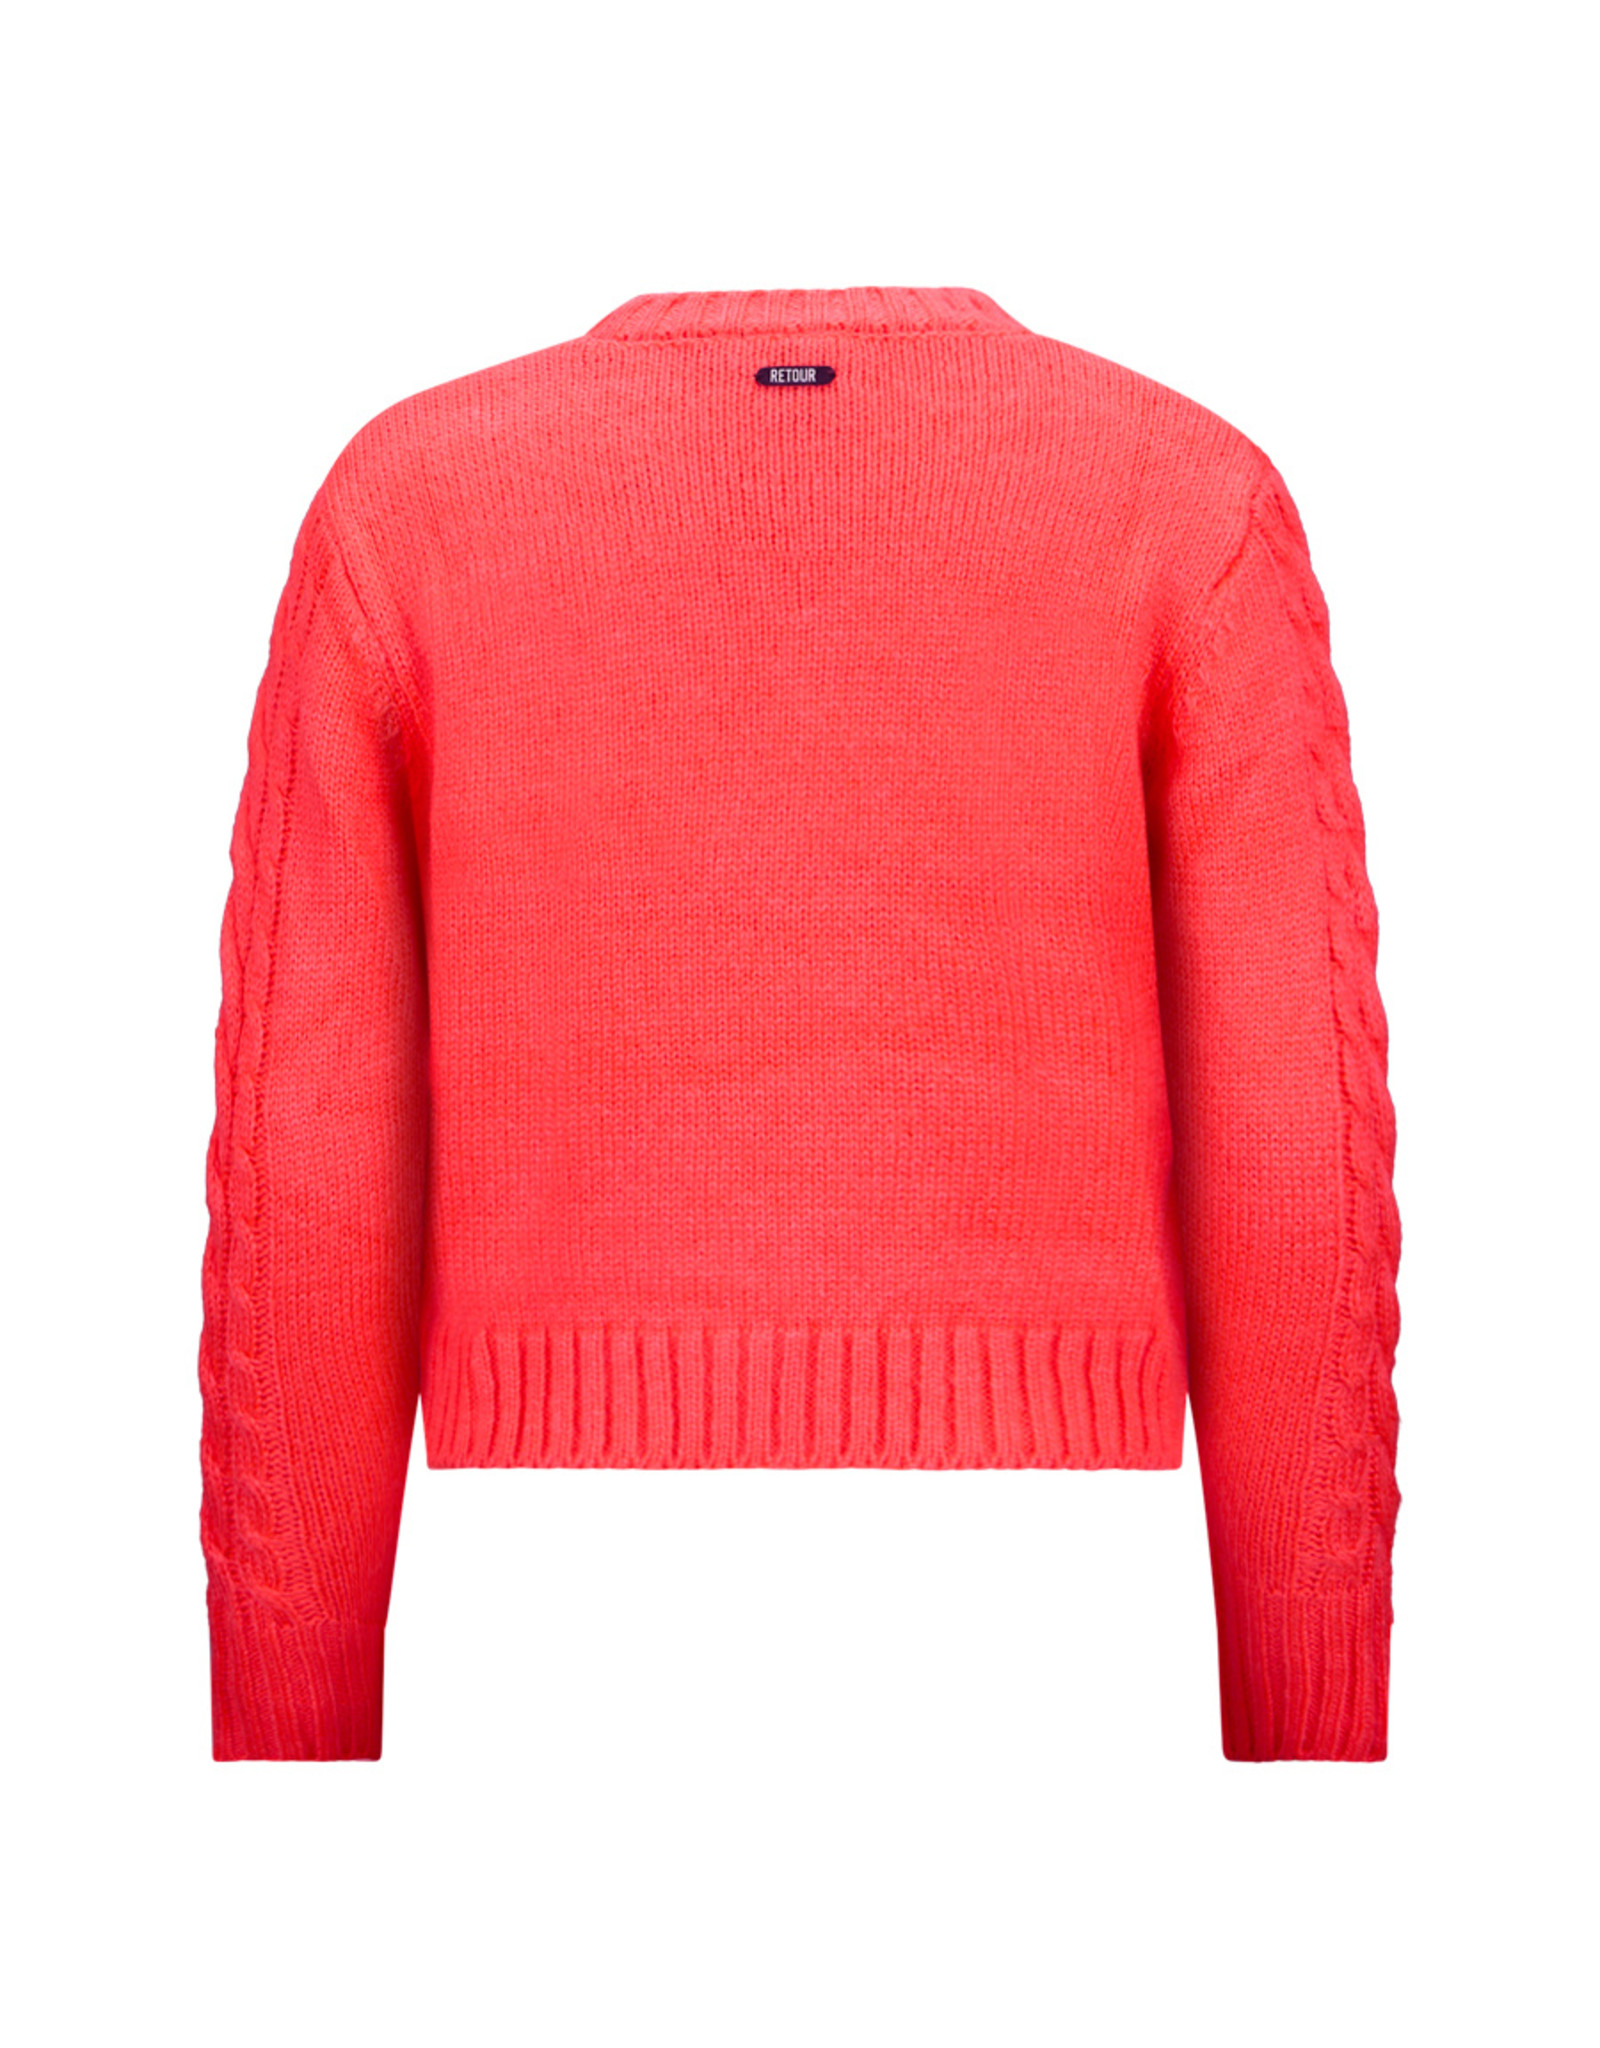 Retour Jeans Girls Beppie Knitwear Neon Coral